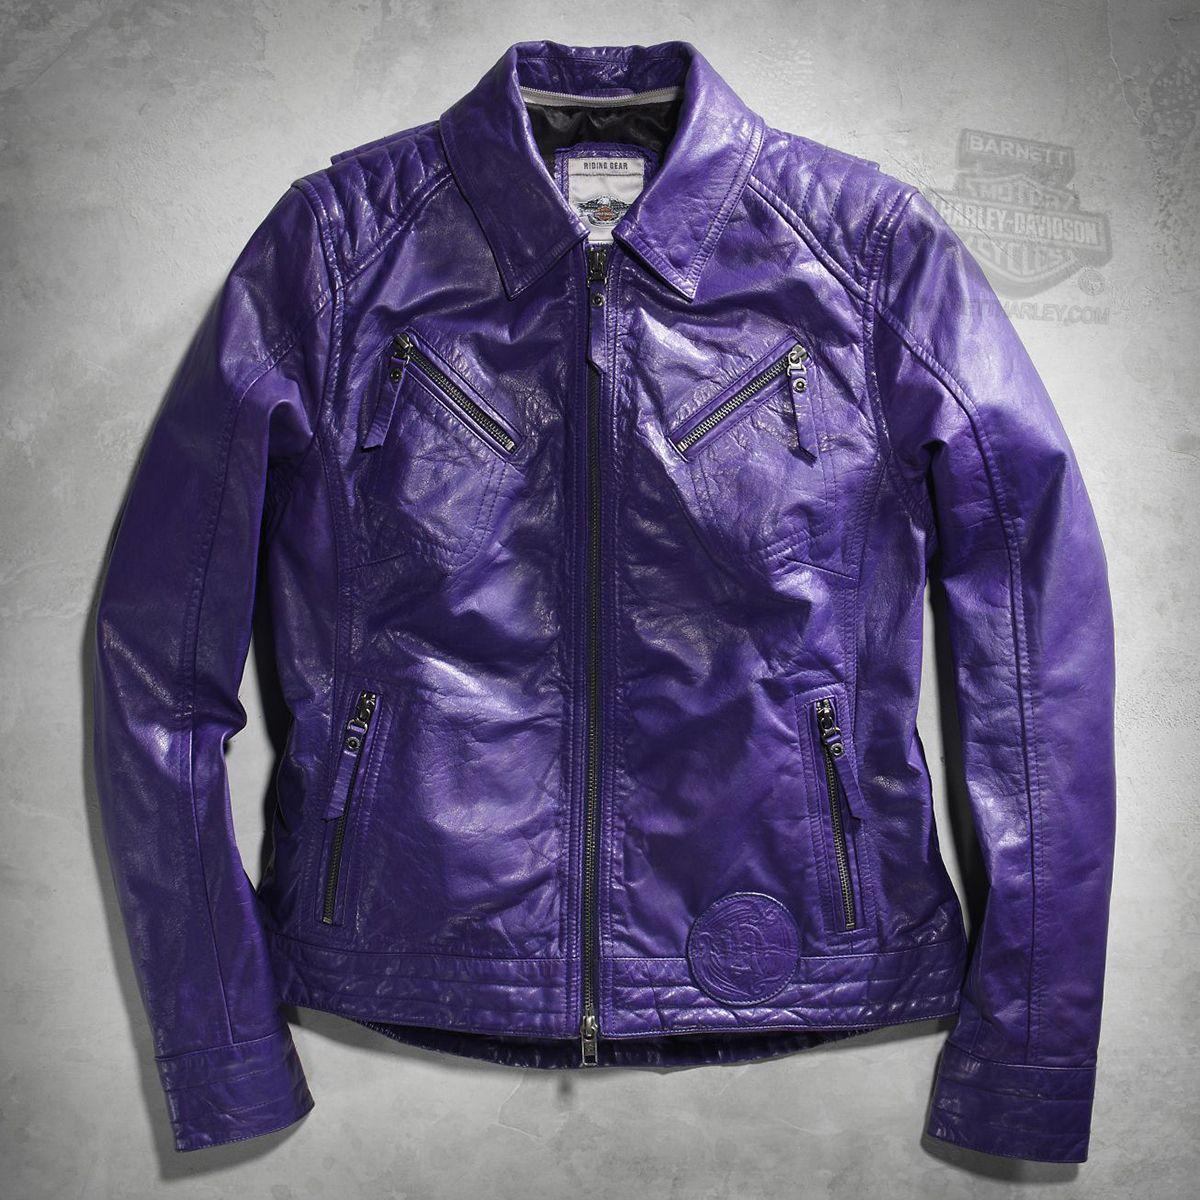 Harley Davidson 97089 16vw Harley Davidson Womens Starless Mock 3 In 1 With Zip Off Hood Leather Jacket Leather Jacket Jackets Harley [ 1200 x 1200 Pixel ]